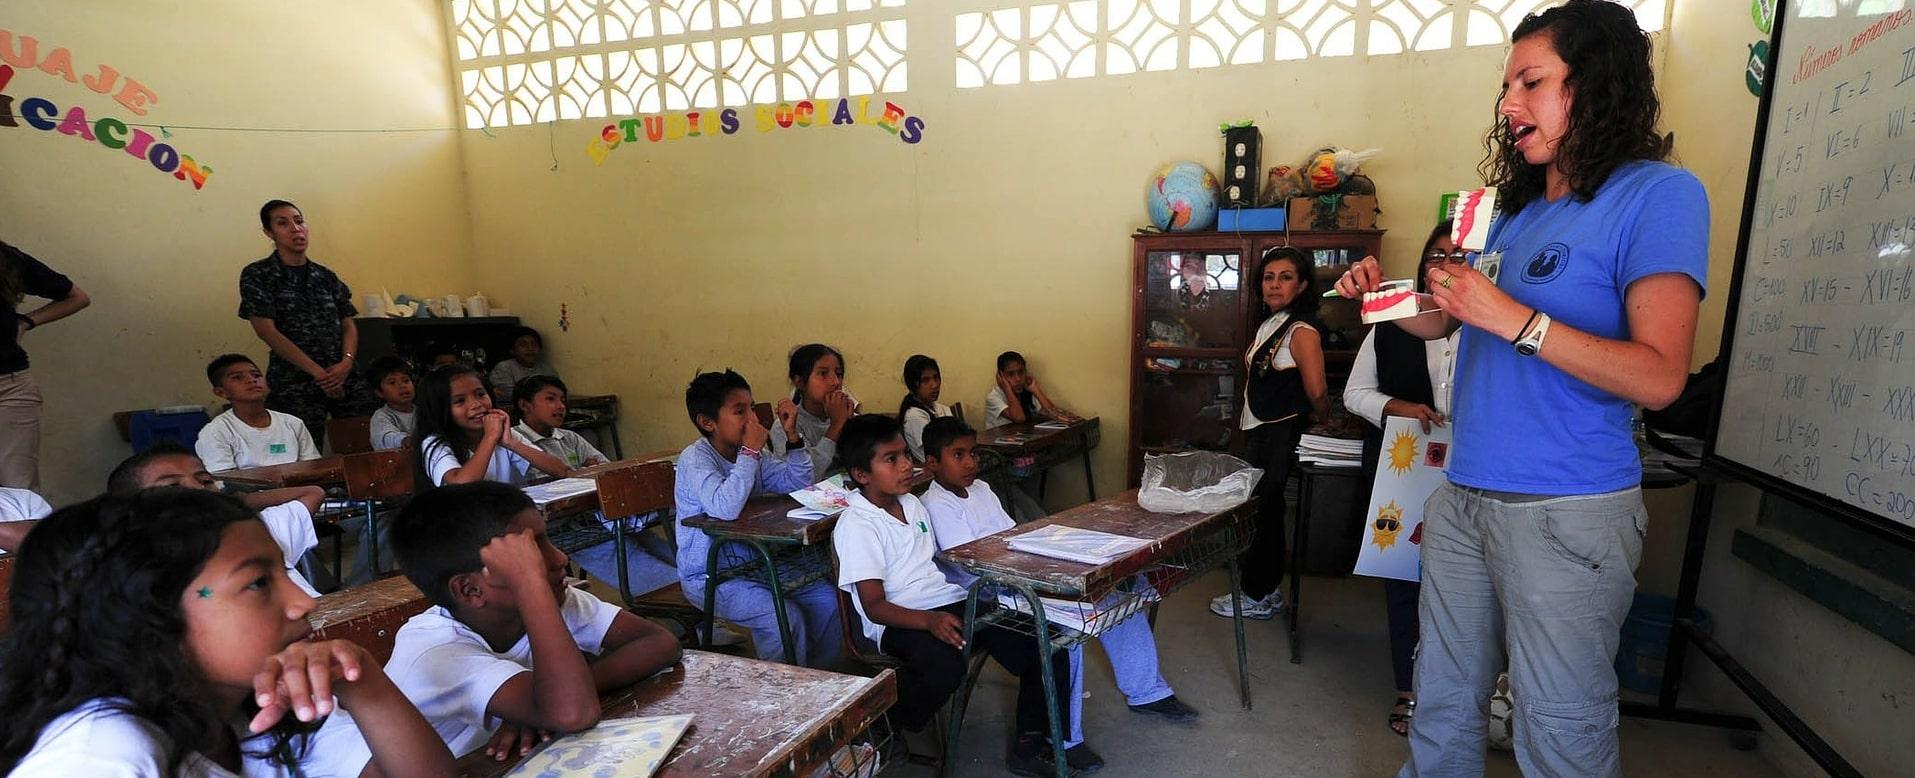 JotForm Educational Technology Classroom